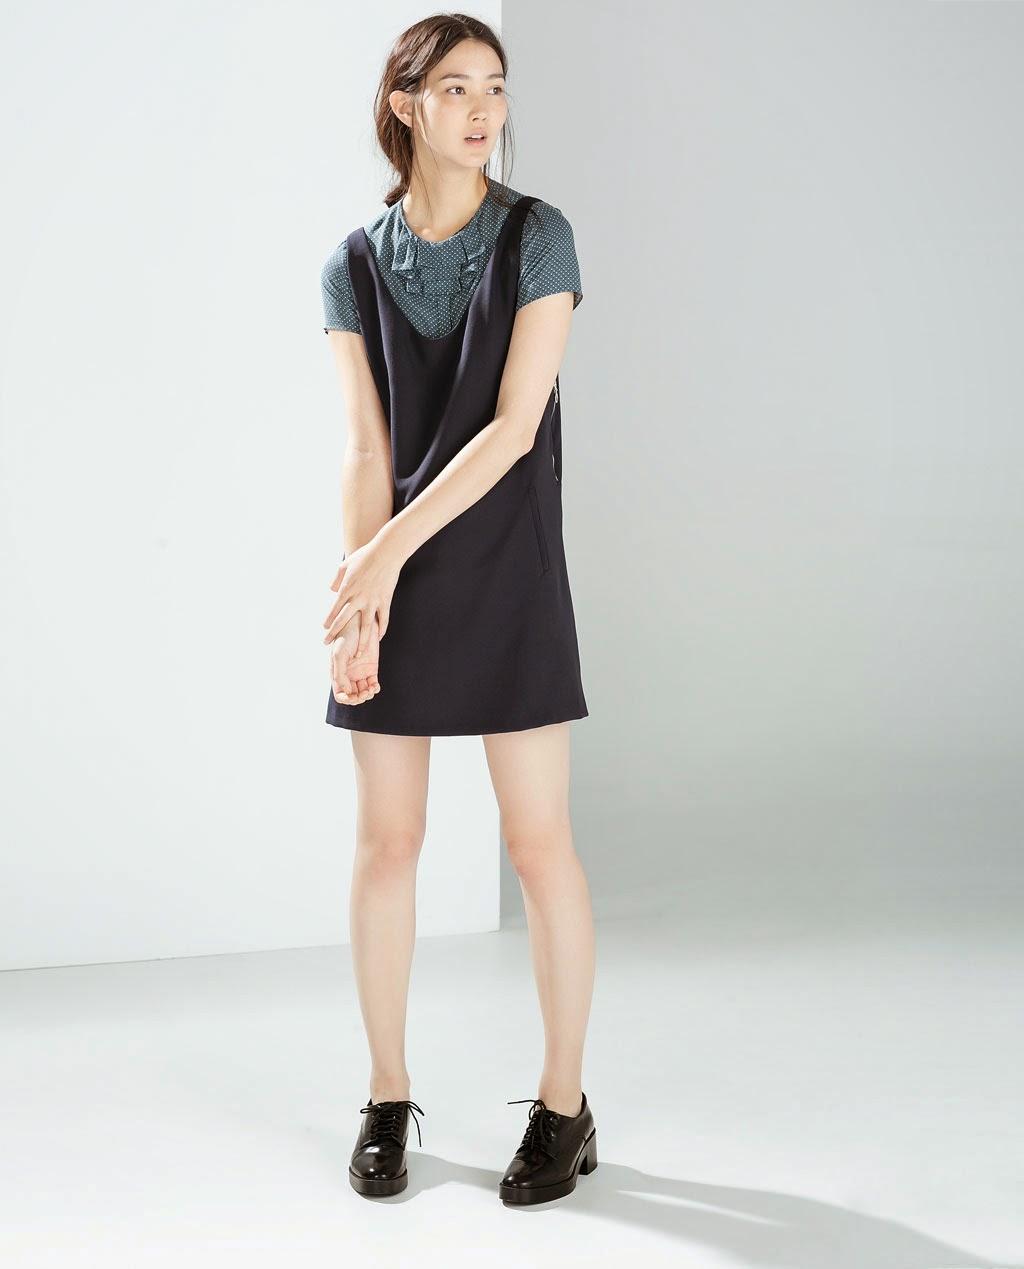 Vestido pichi cremalleras laterales de Zara / Zara lateral zips dress